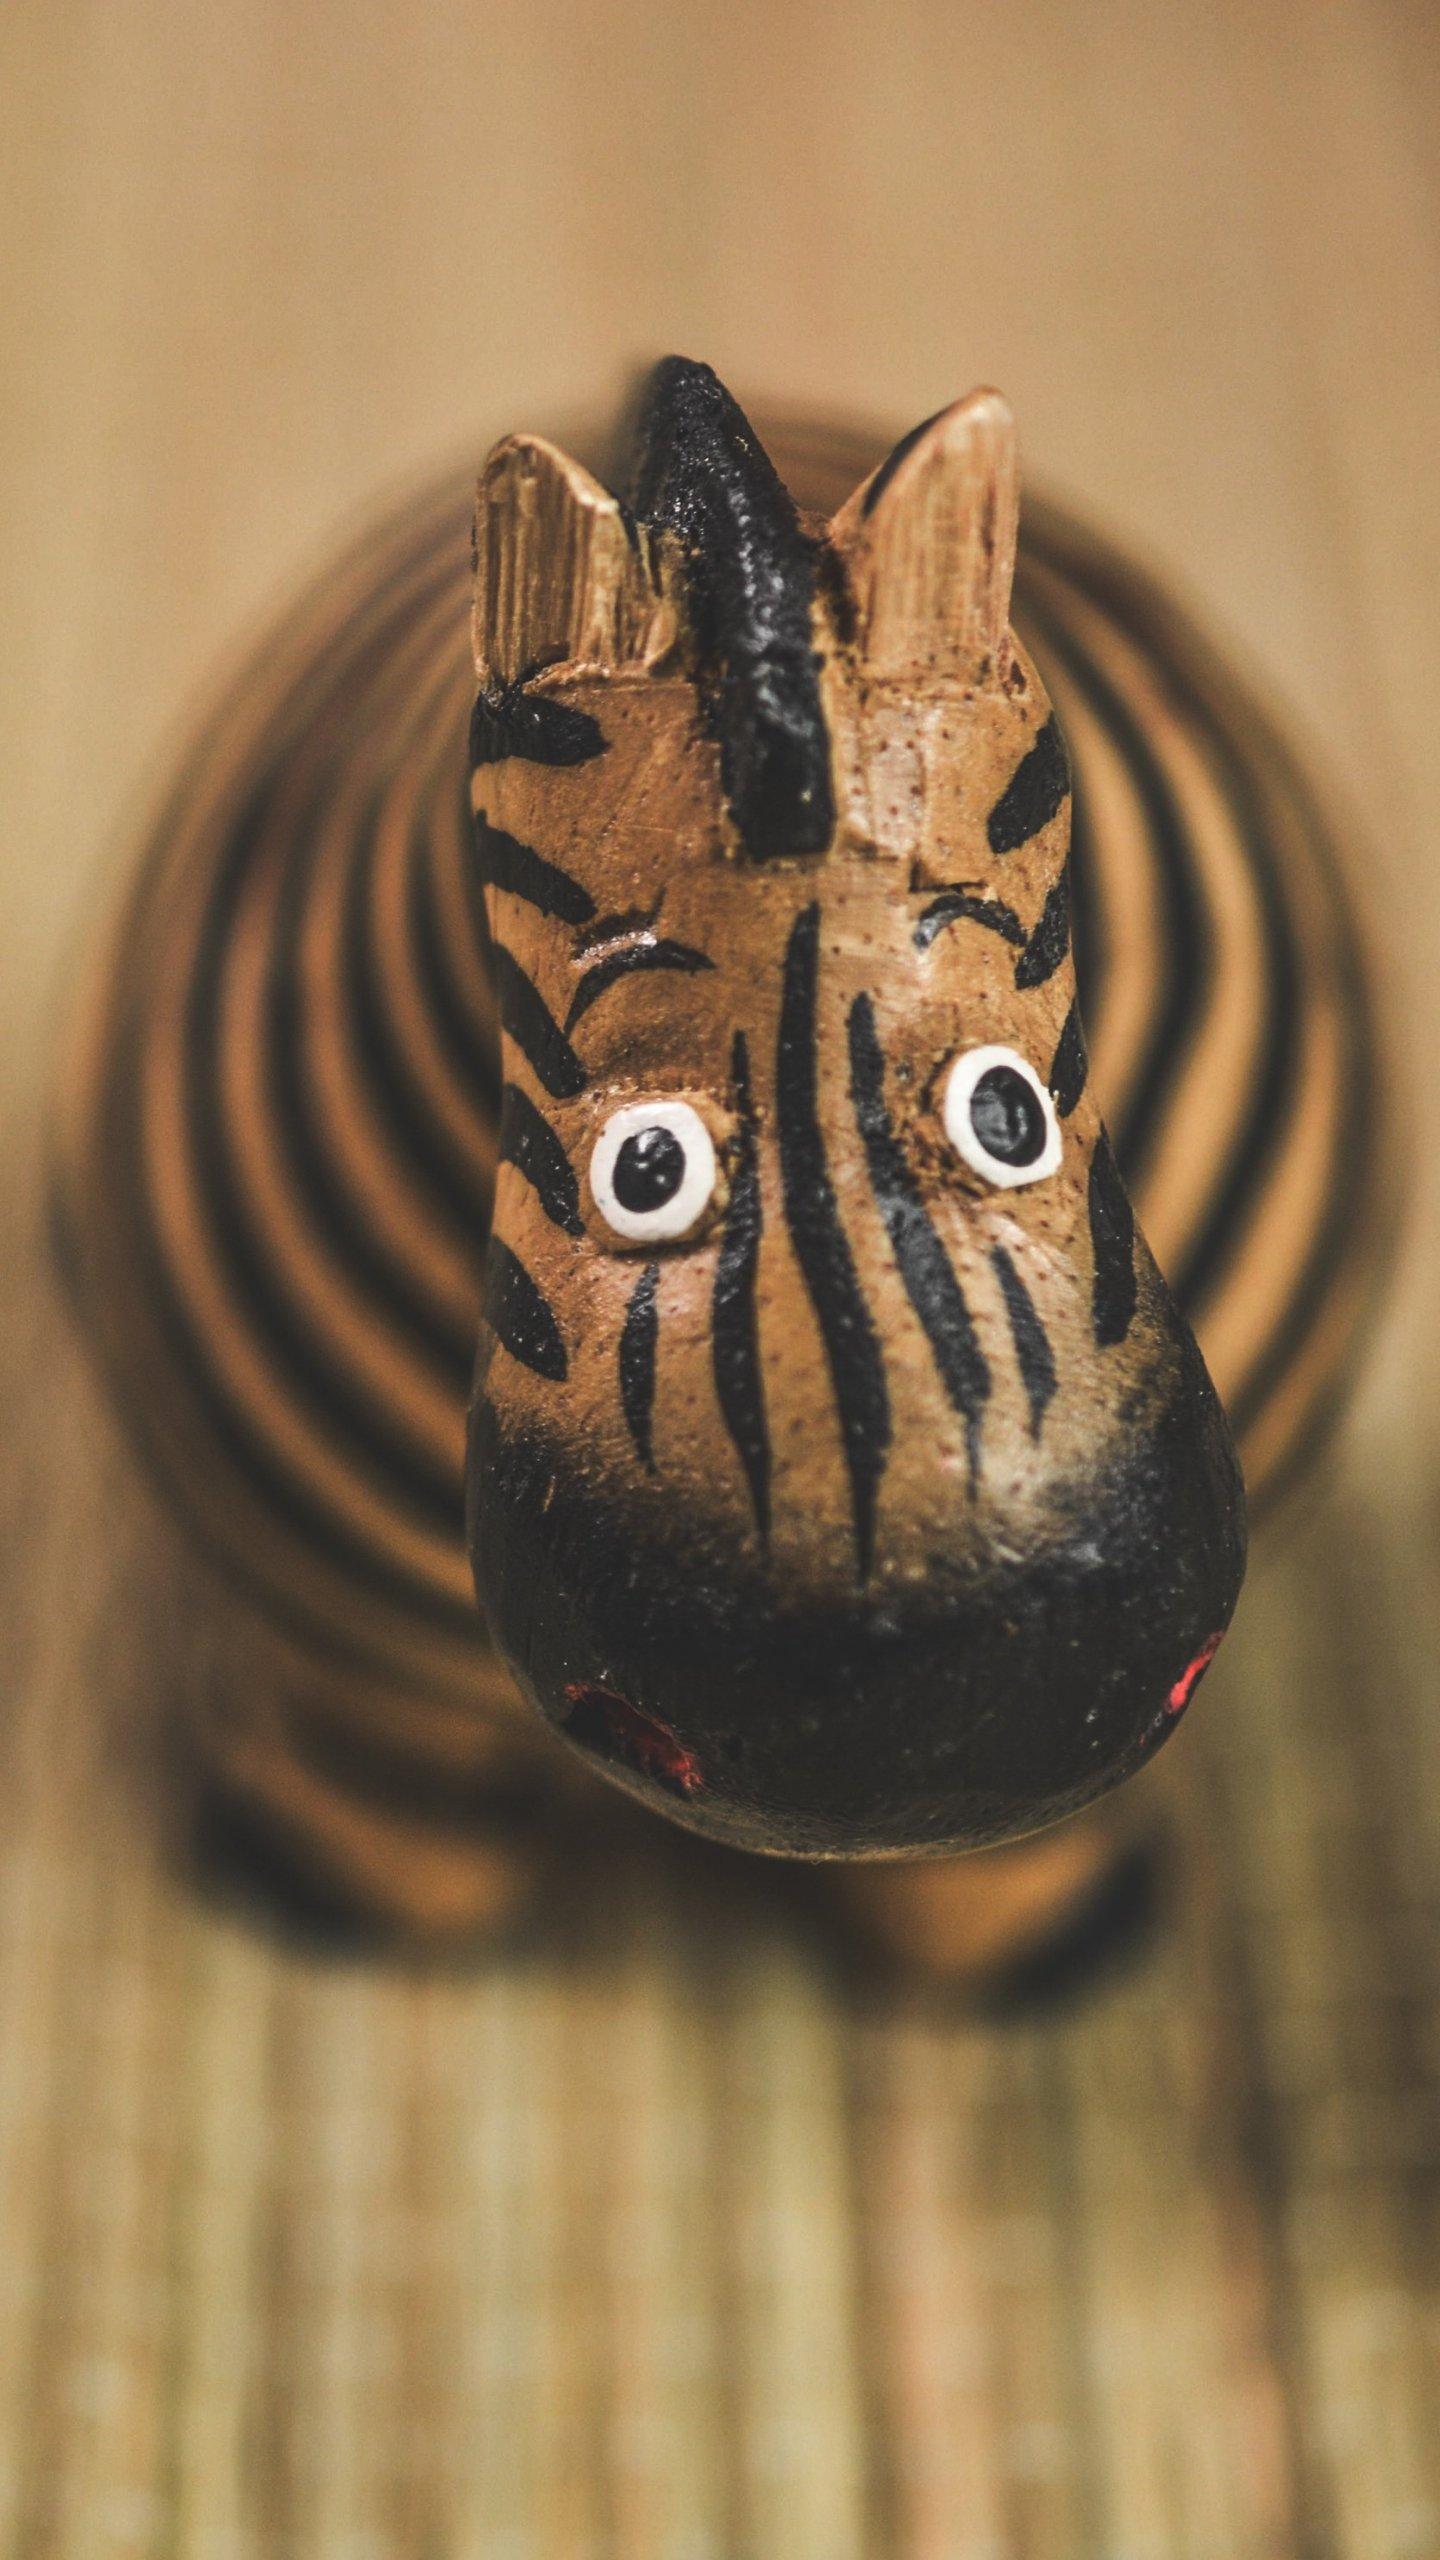 Toy Zebra Wallpaper Iphone Android Desktop Backgrounds